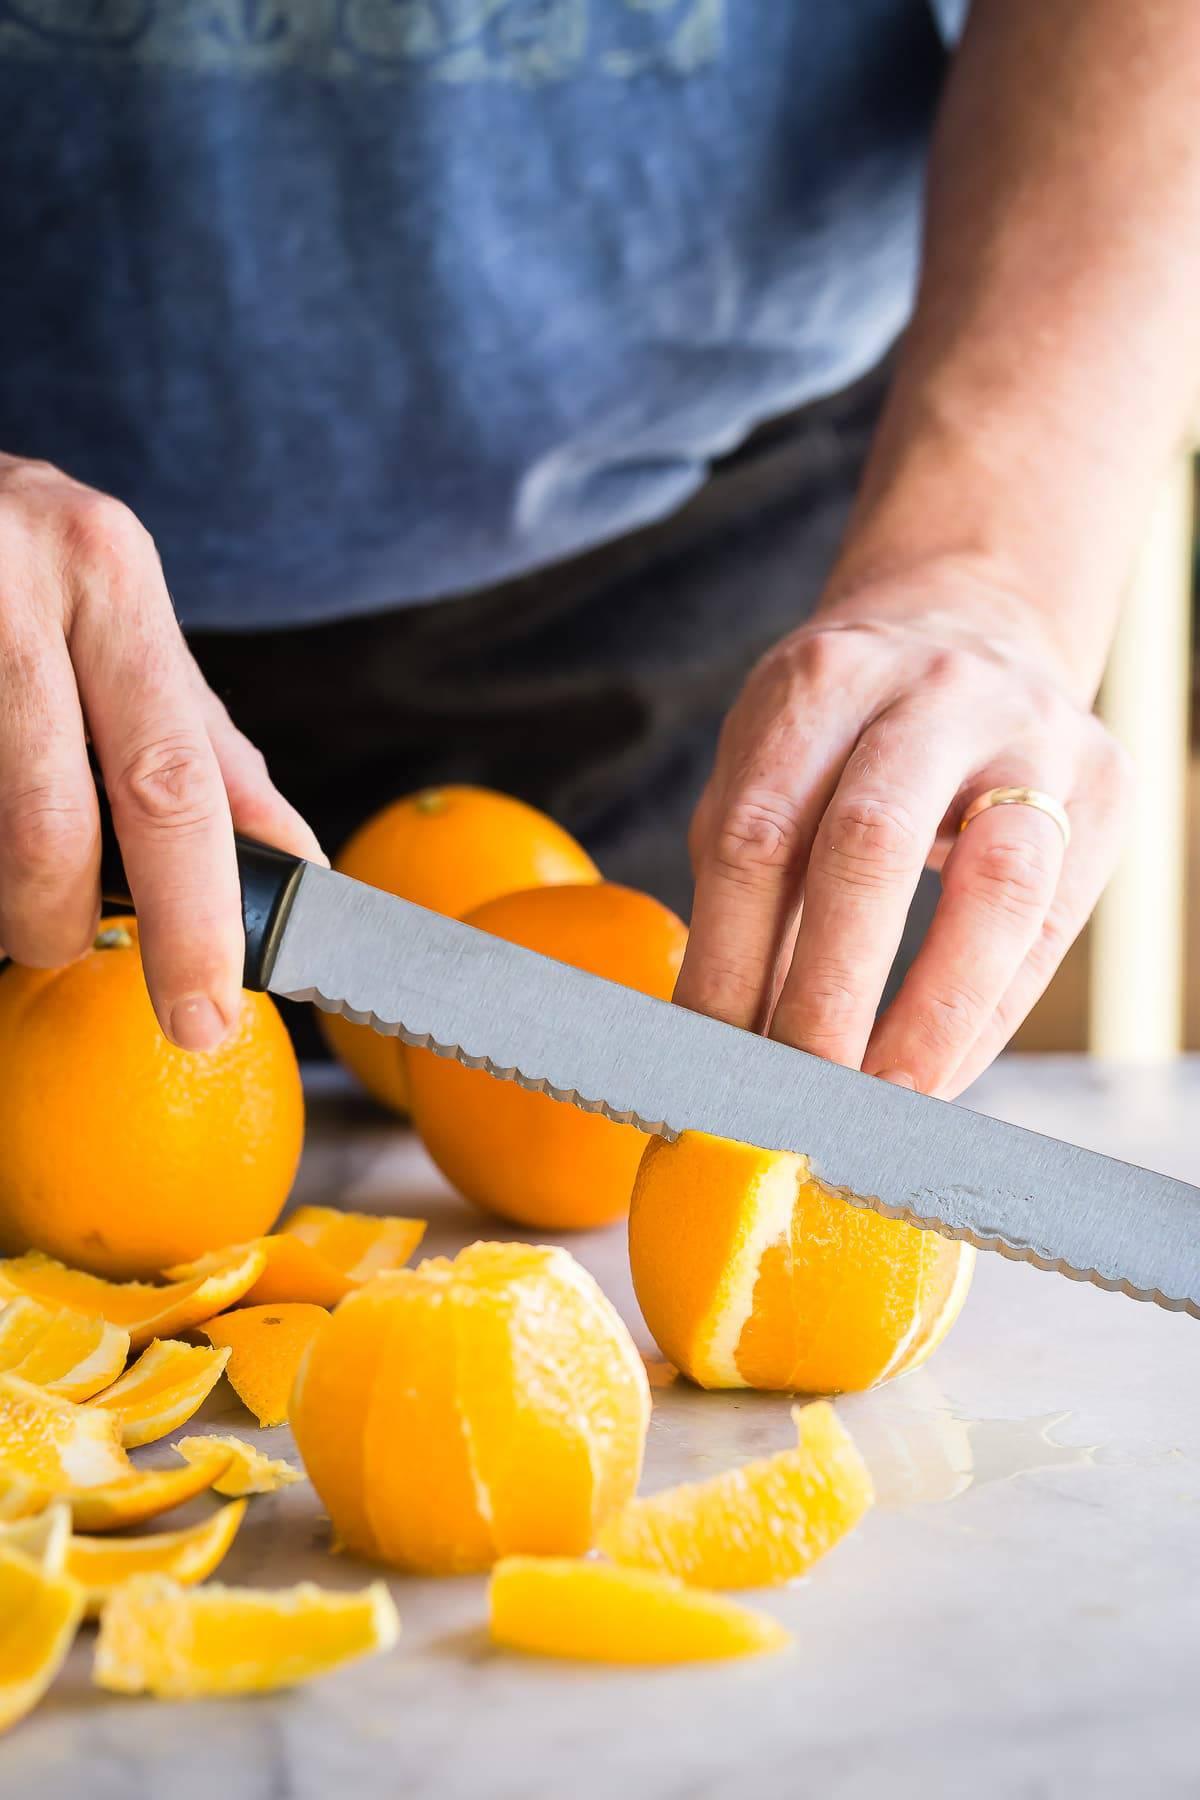 Pan Seared Scallops with an Orange Mango Quinoa Salsa